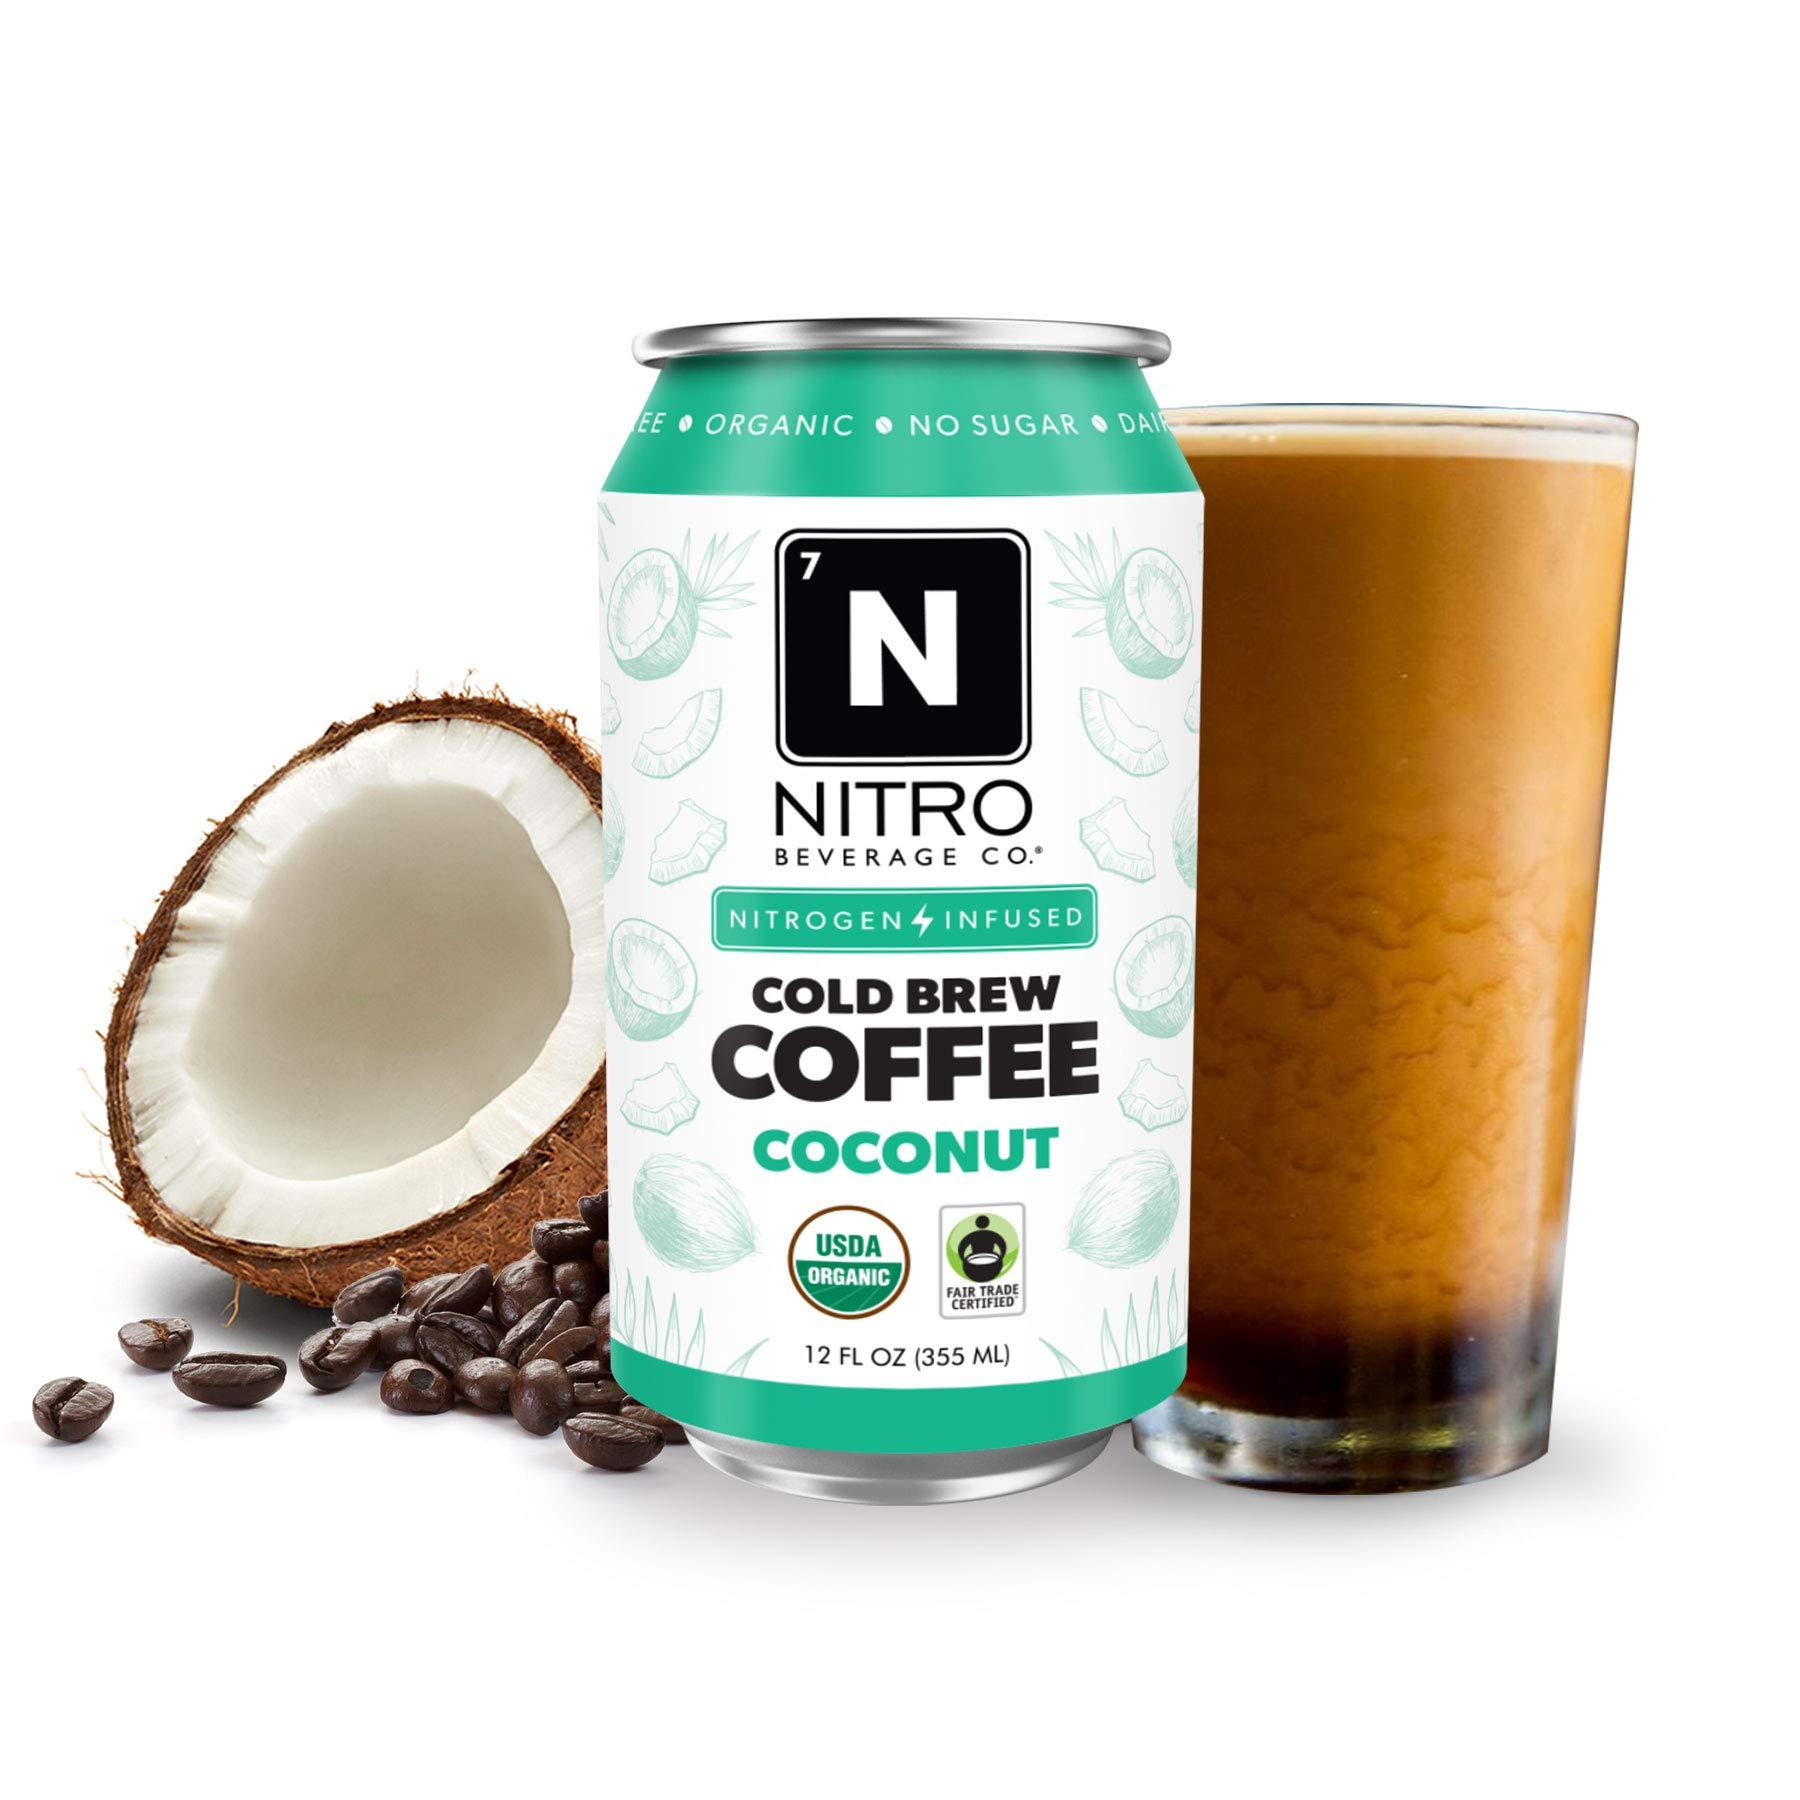 NITRO Beverage Co. | 12-Pack (12 fl oz) | Coconut NITRO Cold Brew Coffee | Certified Organic & Fair-Trade | Sugar Free, Dairy Free, Zero Calories | Always Cold, Always Fresh